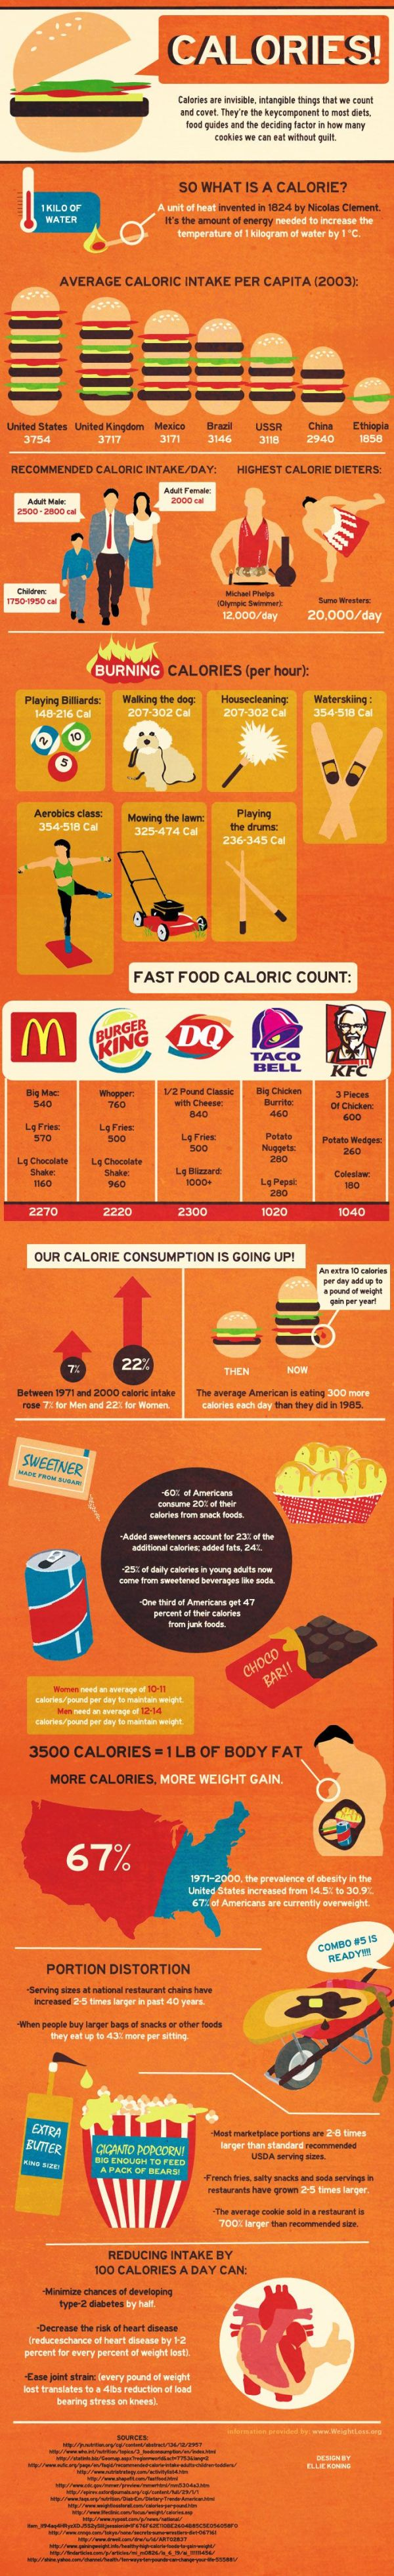 Calories-info